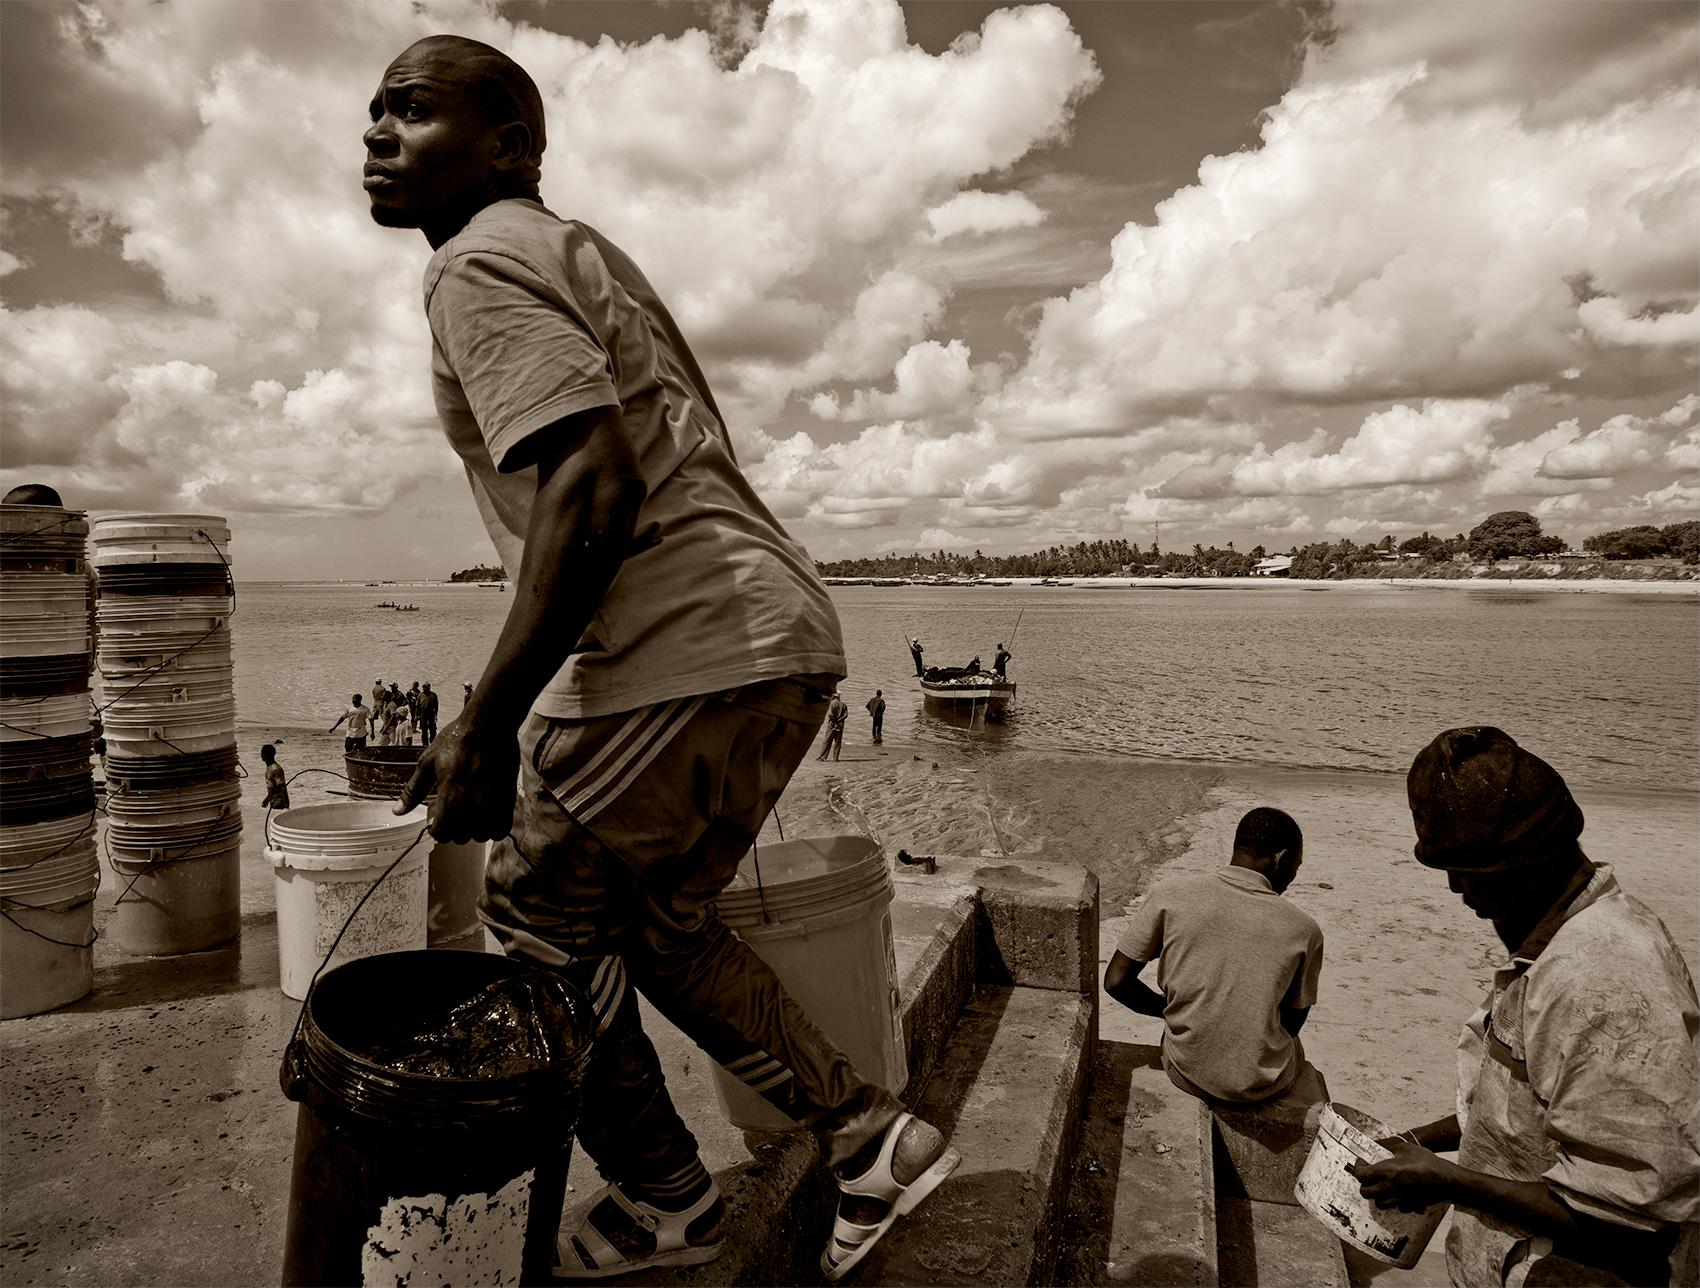 Fish market, Dar Es Salaam, Tanzania